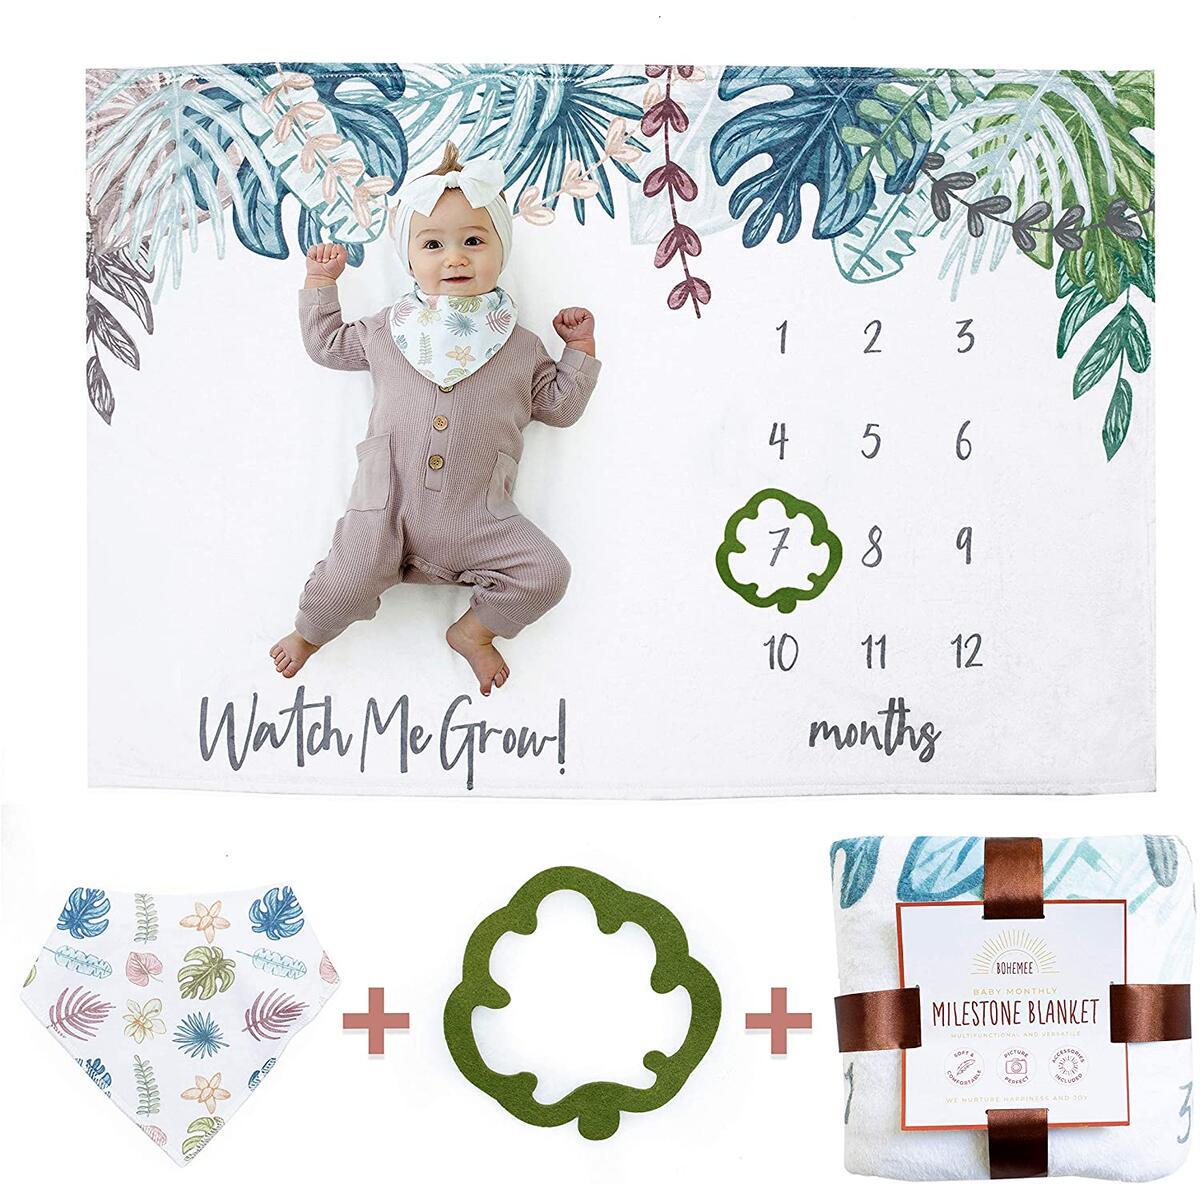 BOHEMEE Baby Milestone Blanket. Boho Photo Blanket with Baby Bandana Bib and Baby Month Blanket Leaf Indicator. Baby Monthly Milestone Blanket Boy and Newborn Baby Girl Stuff. Unisex Age Growth Chart